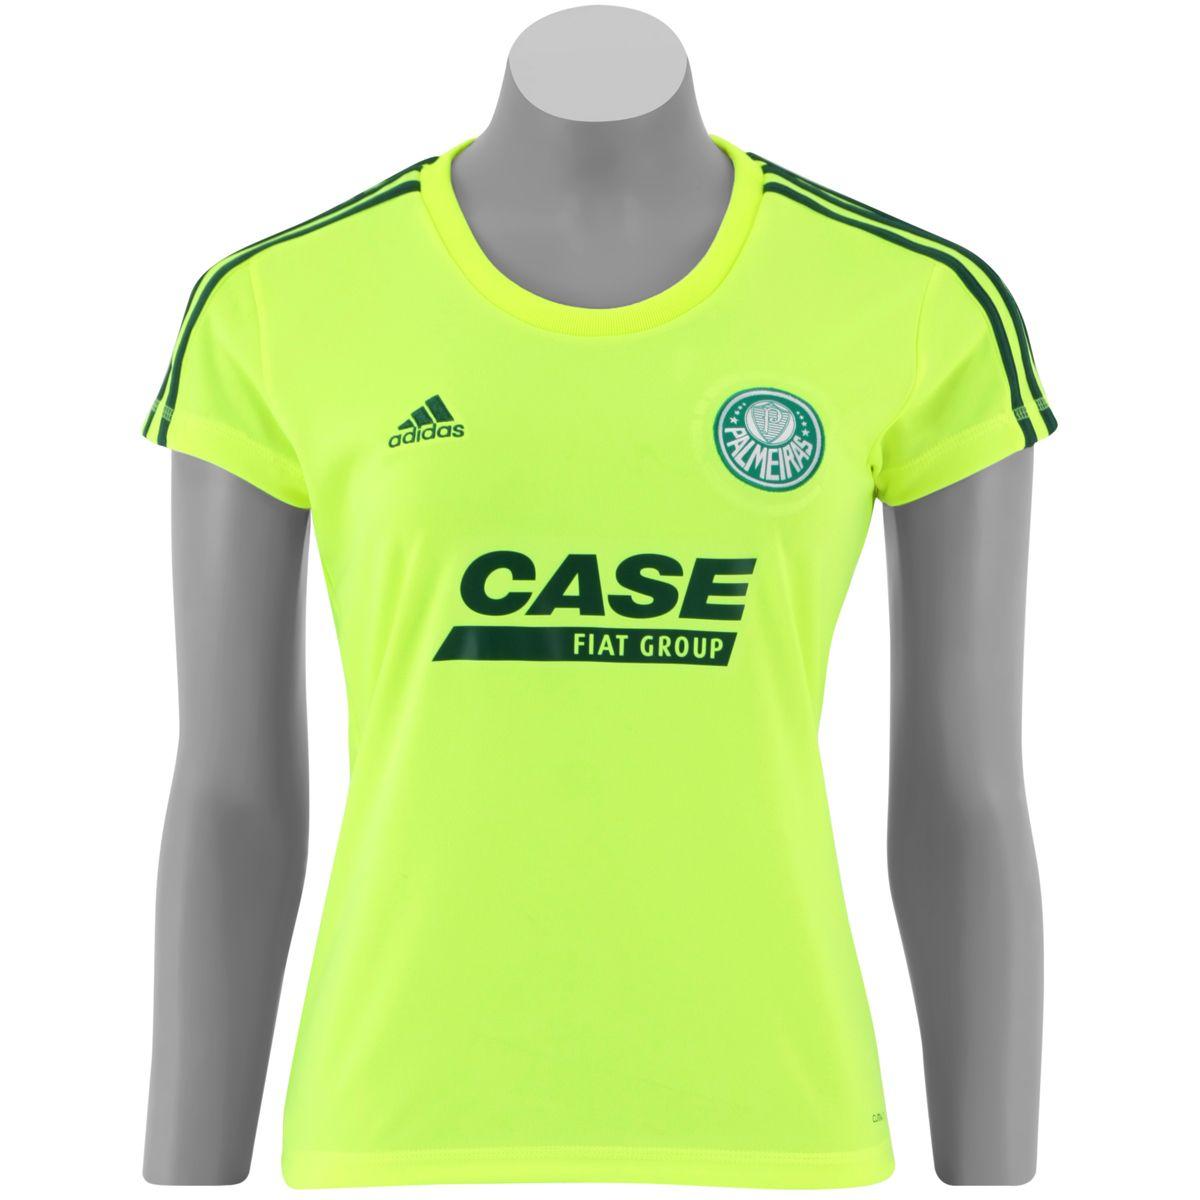 camisa palmeiras - Busca na NT Sports 6240127292655